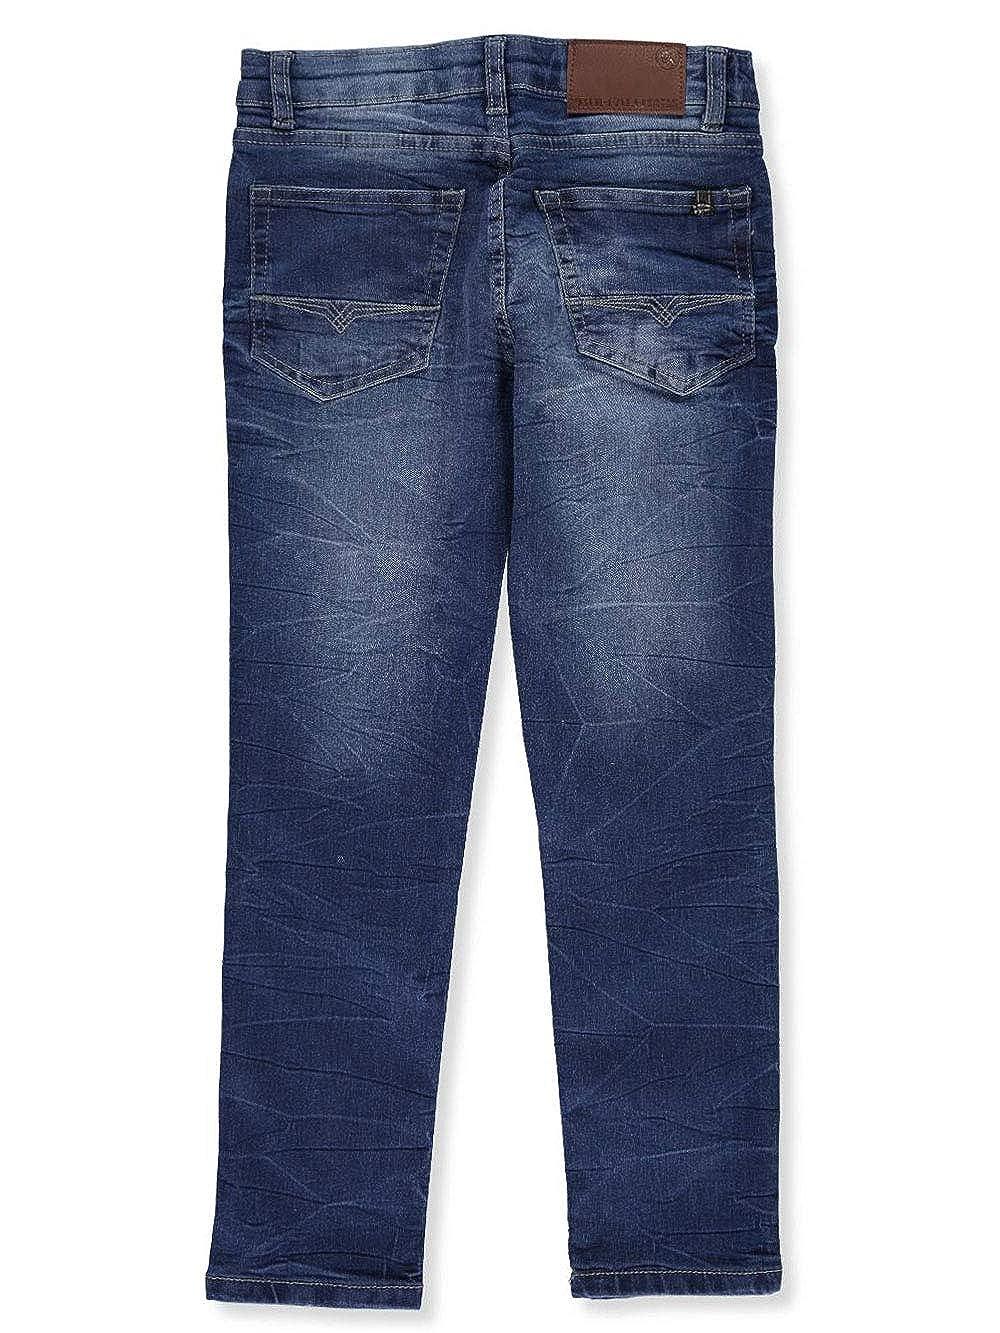 Buffalo by David Bitton Boys Max Crinkle Wash Skinny Jeans